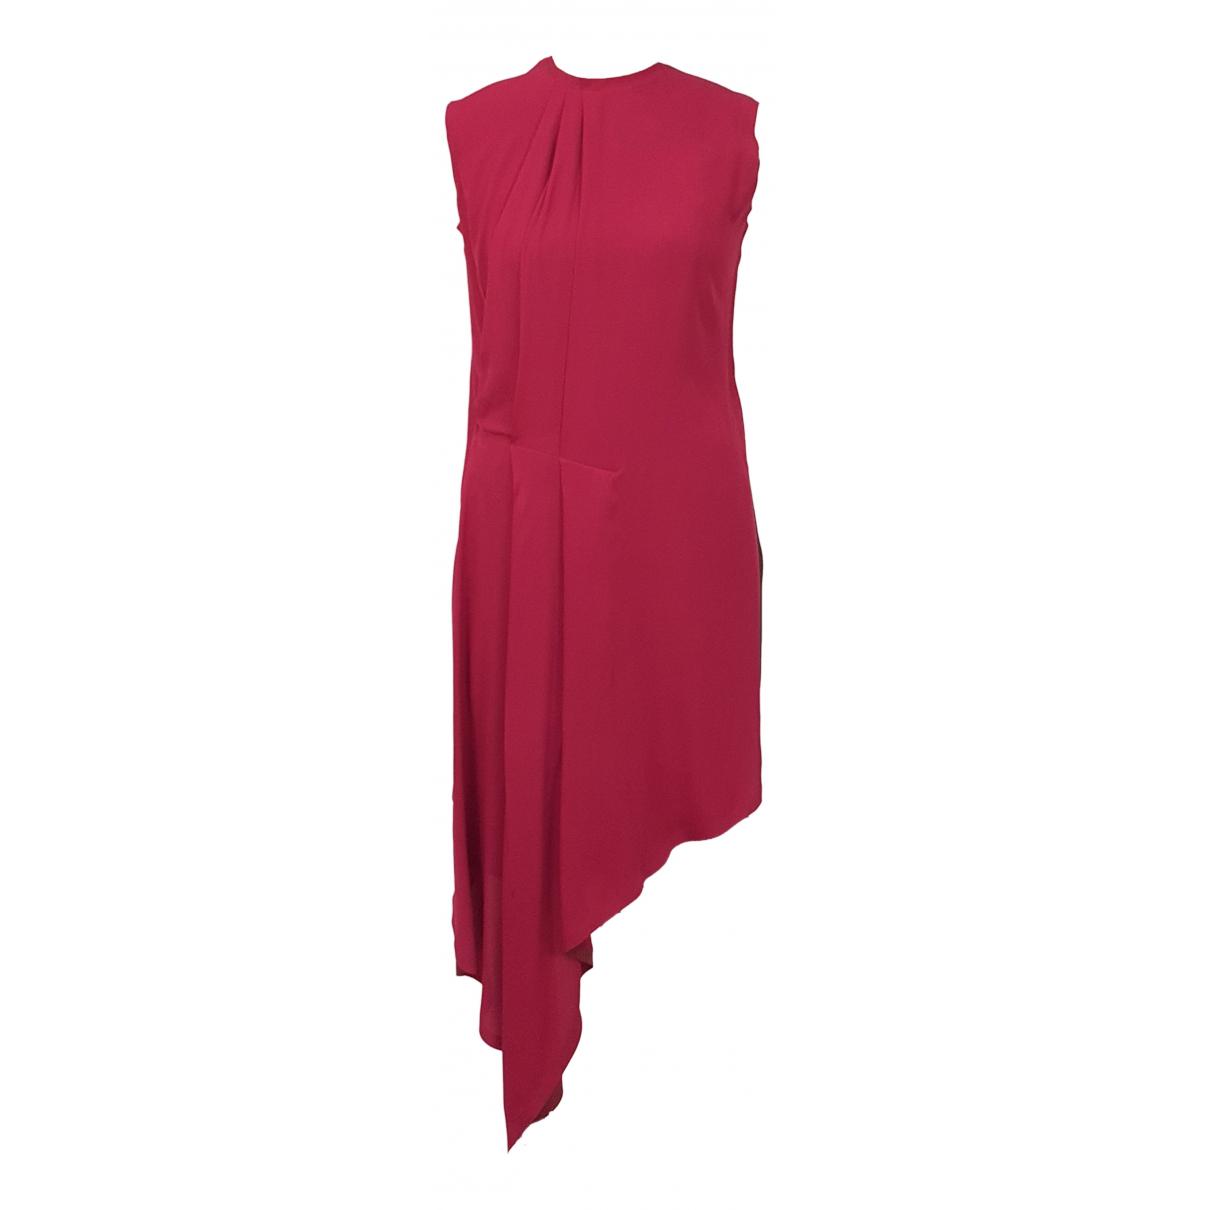 Maison Martin Margiela \N Kleid in  Rot Seide